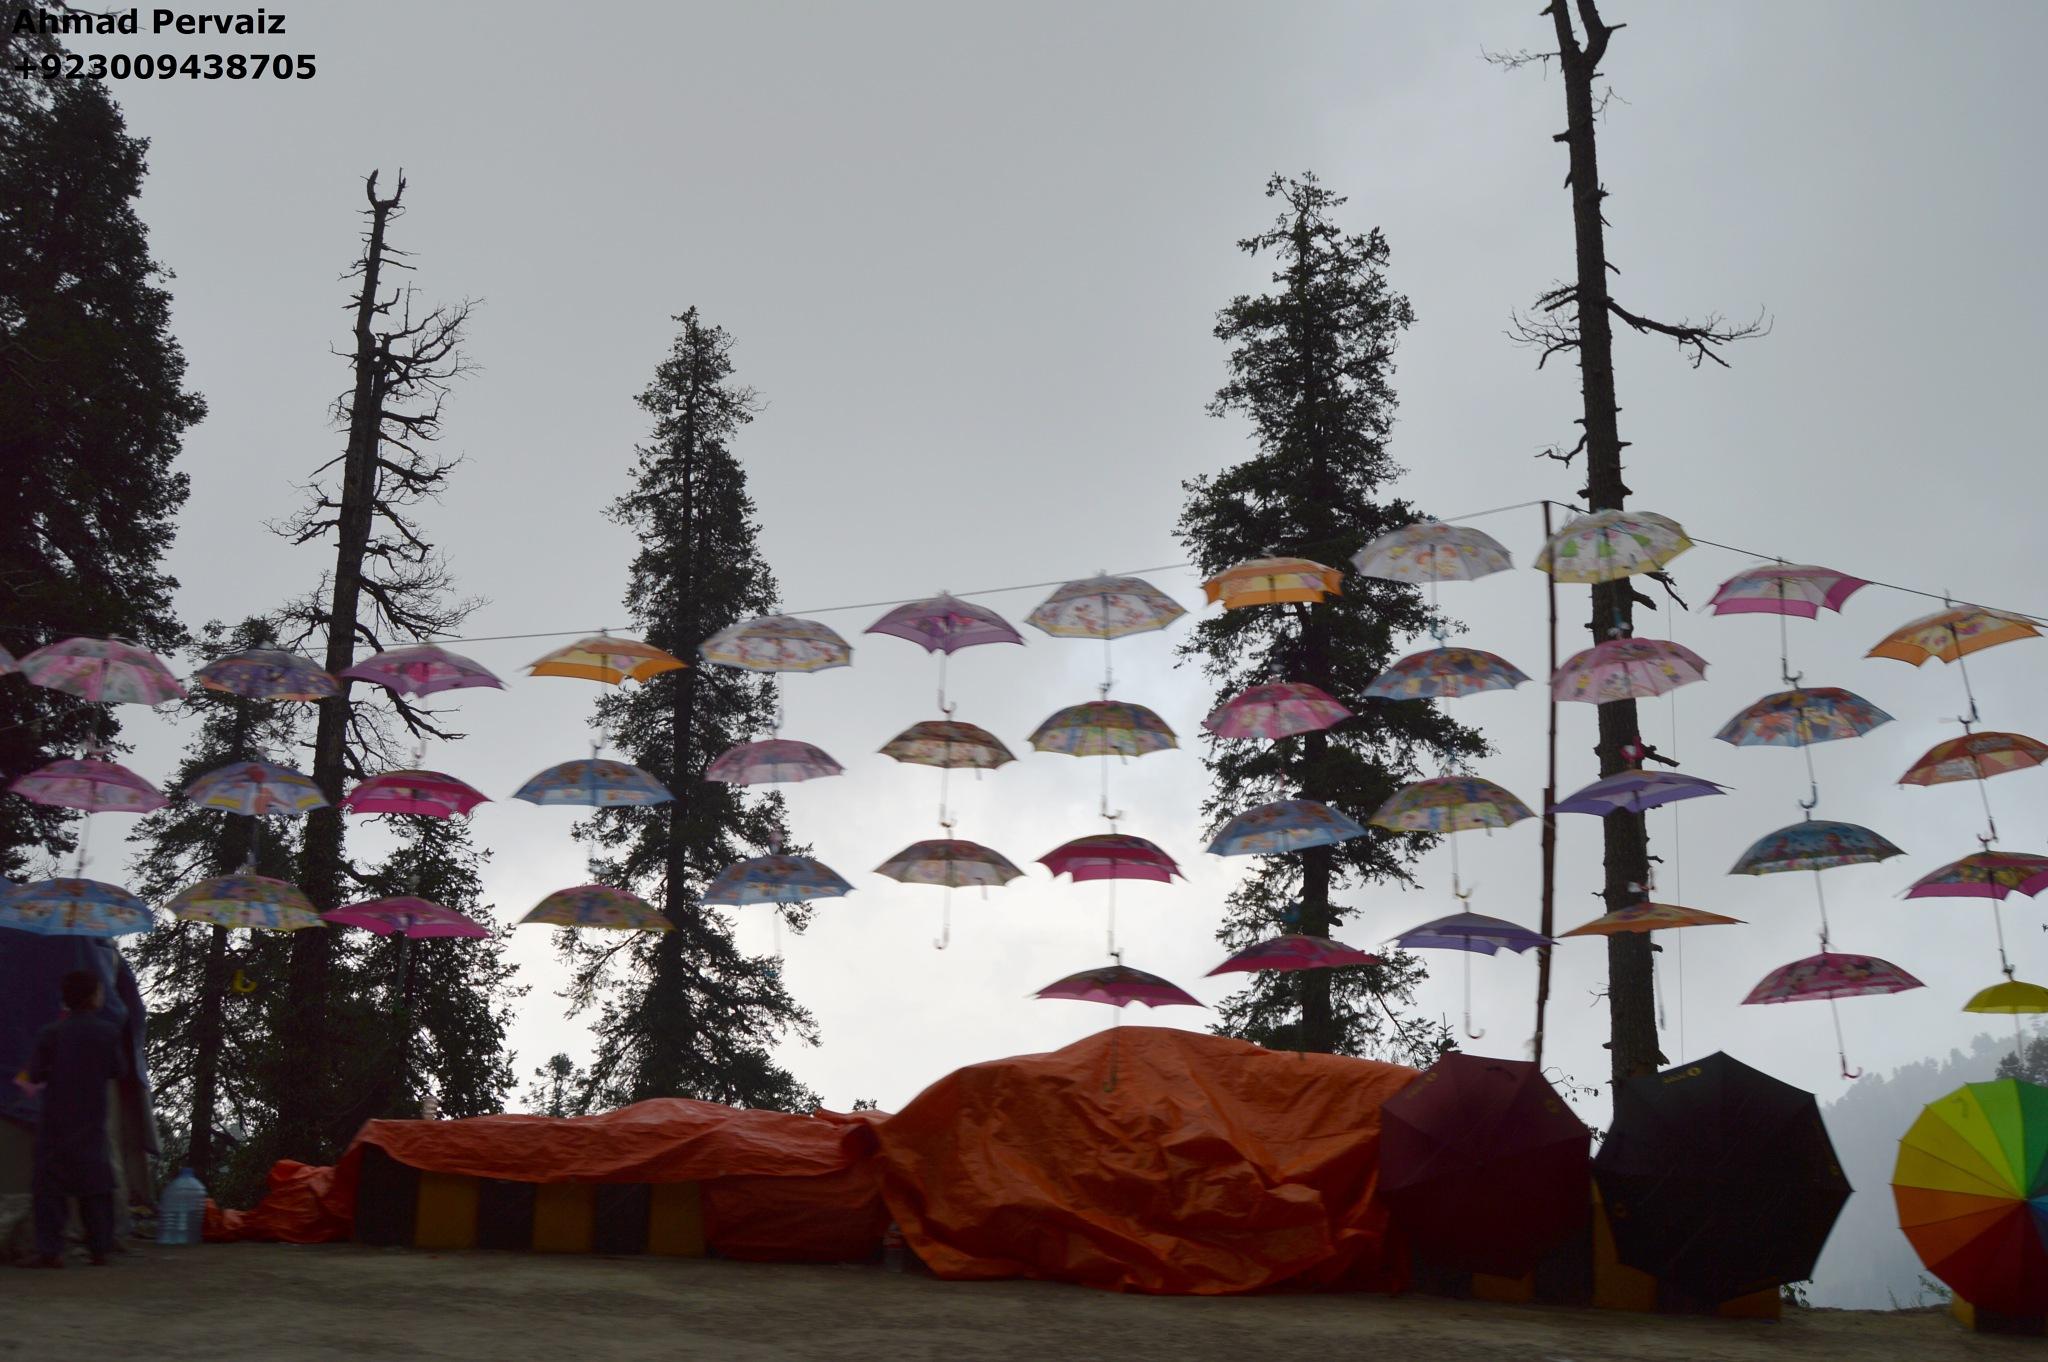 Umbrellas by pervaiz_jiu-jitsu